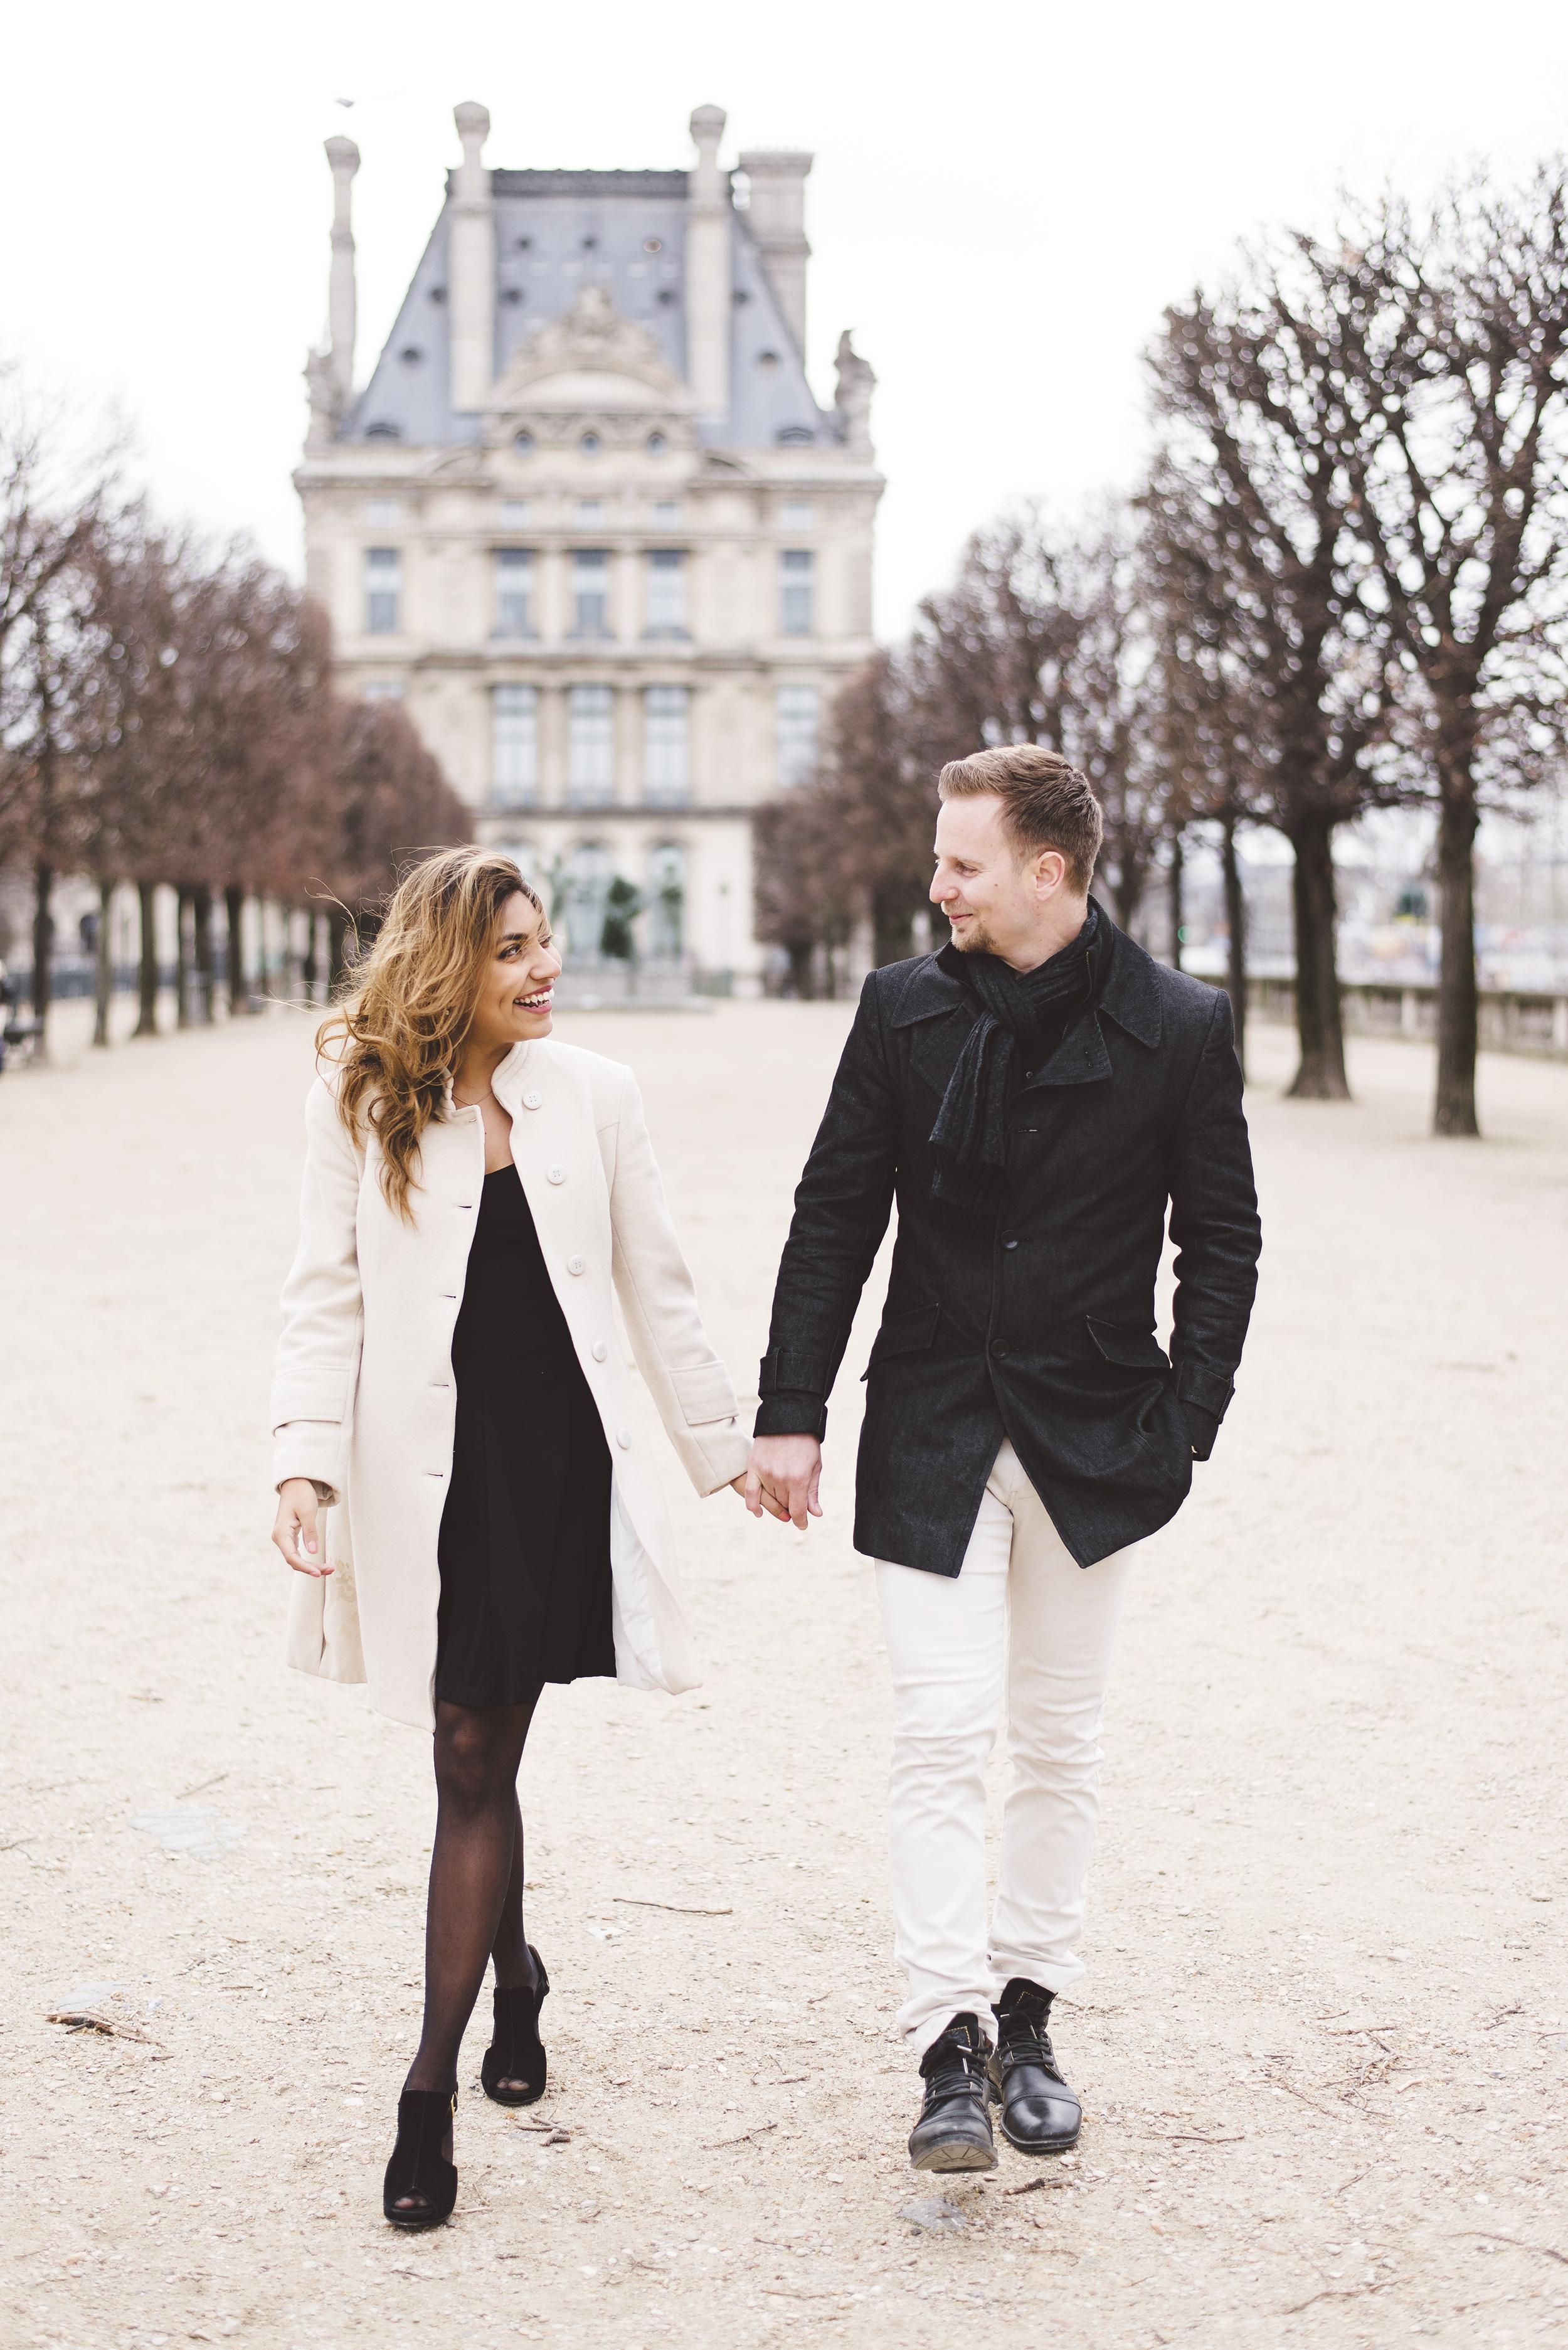 Couple-photoshoot-Anniversary-Paris-Louvre-Tuileries042.jpg